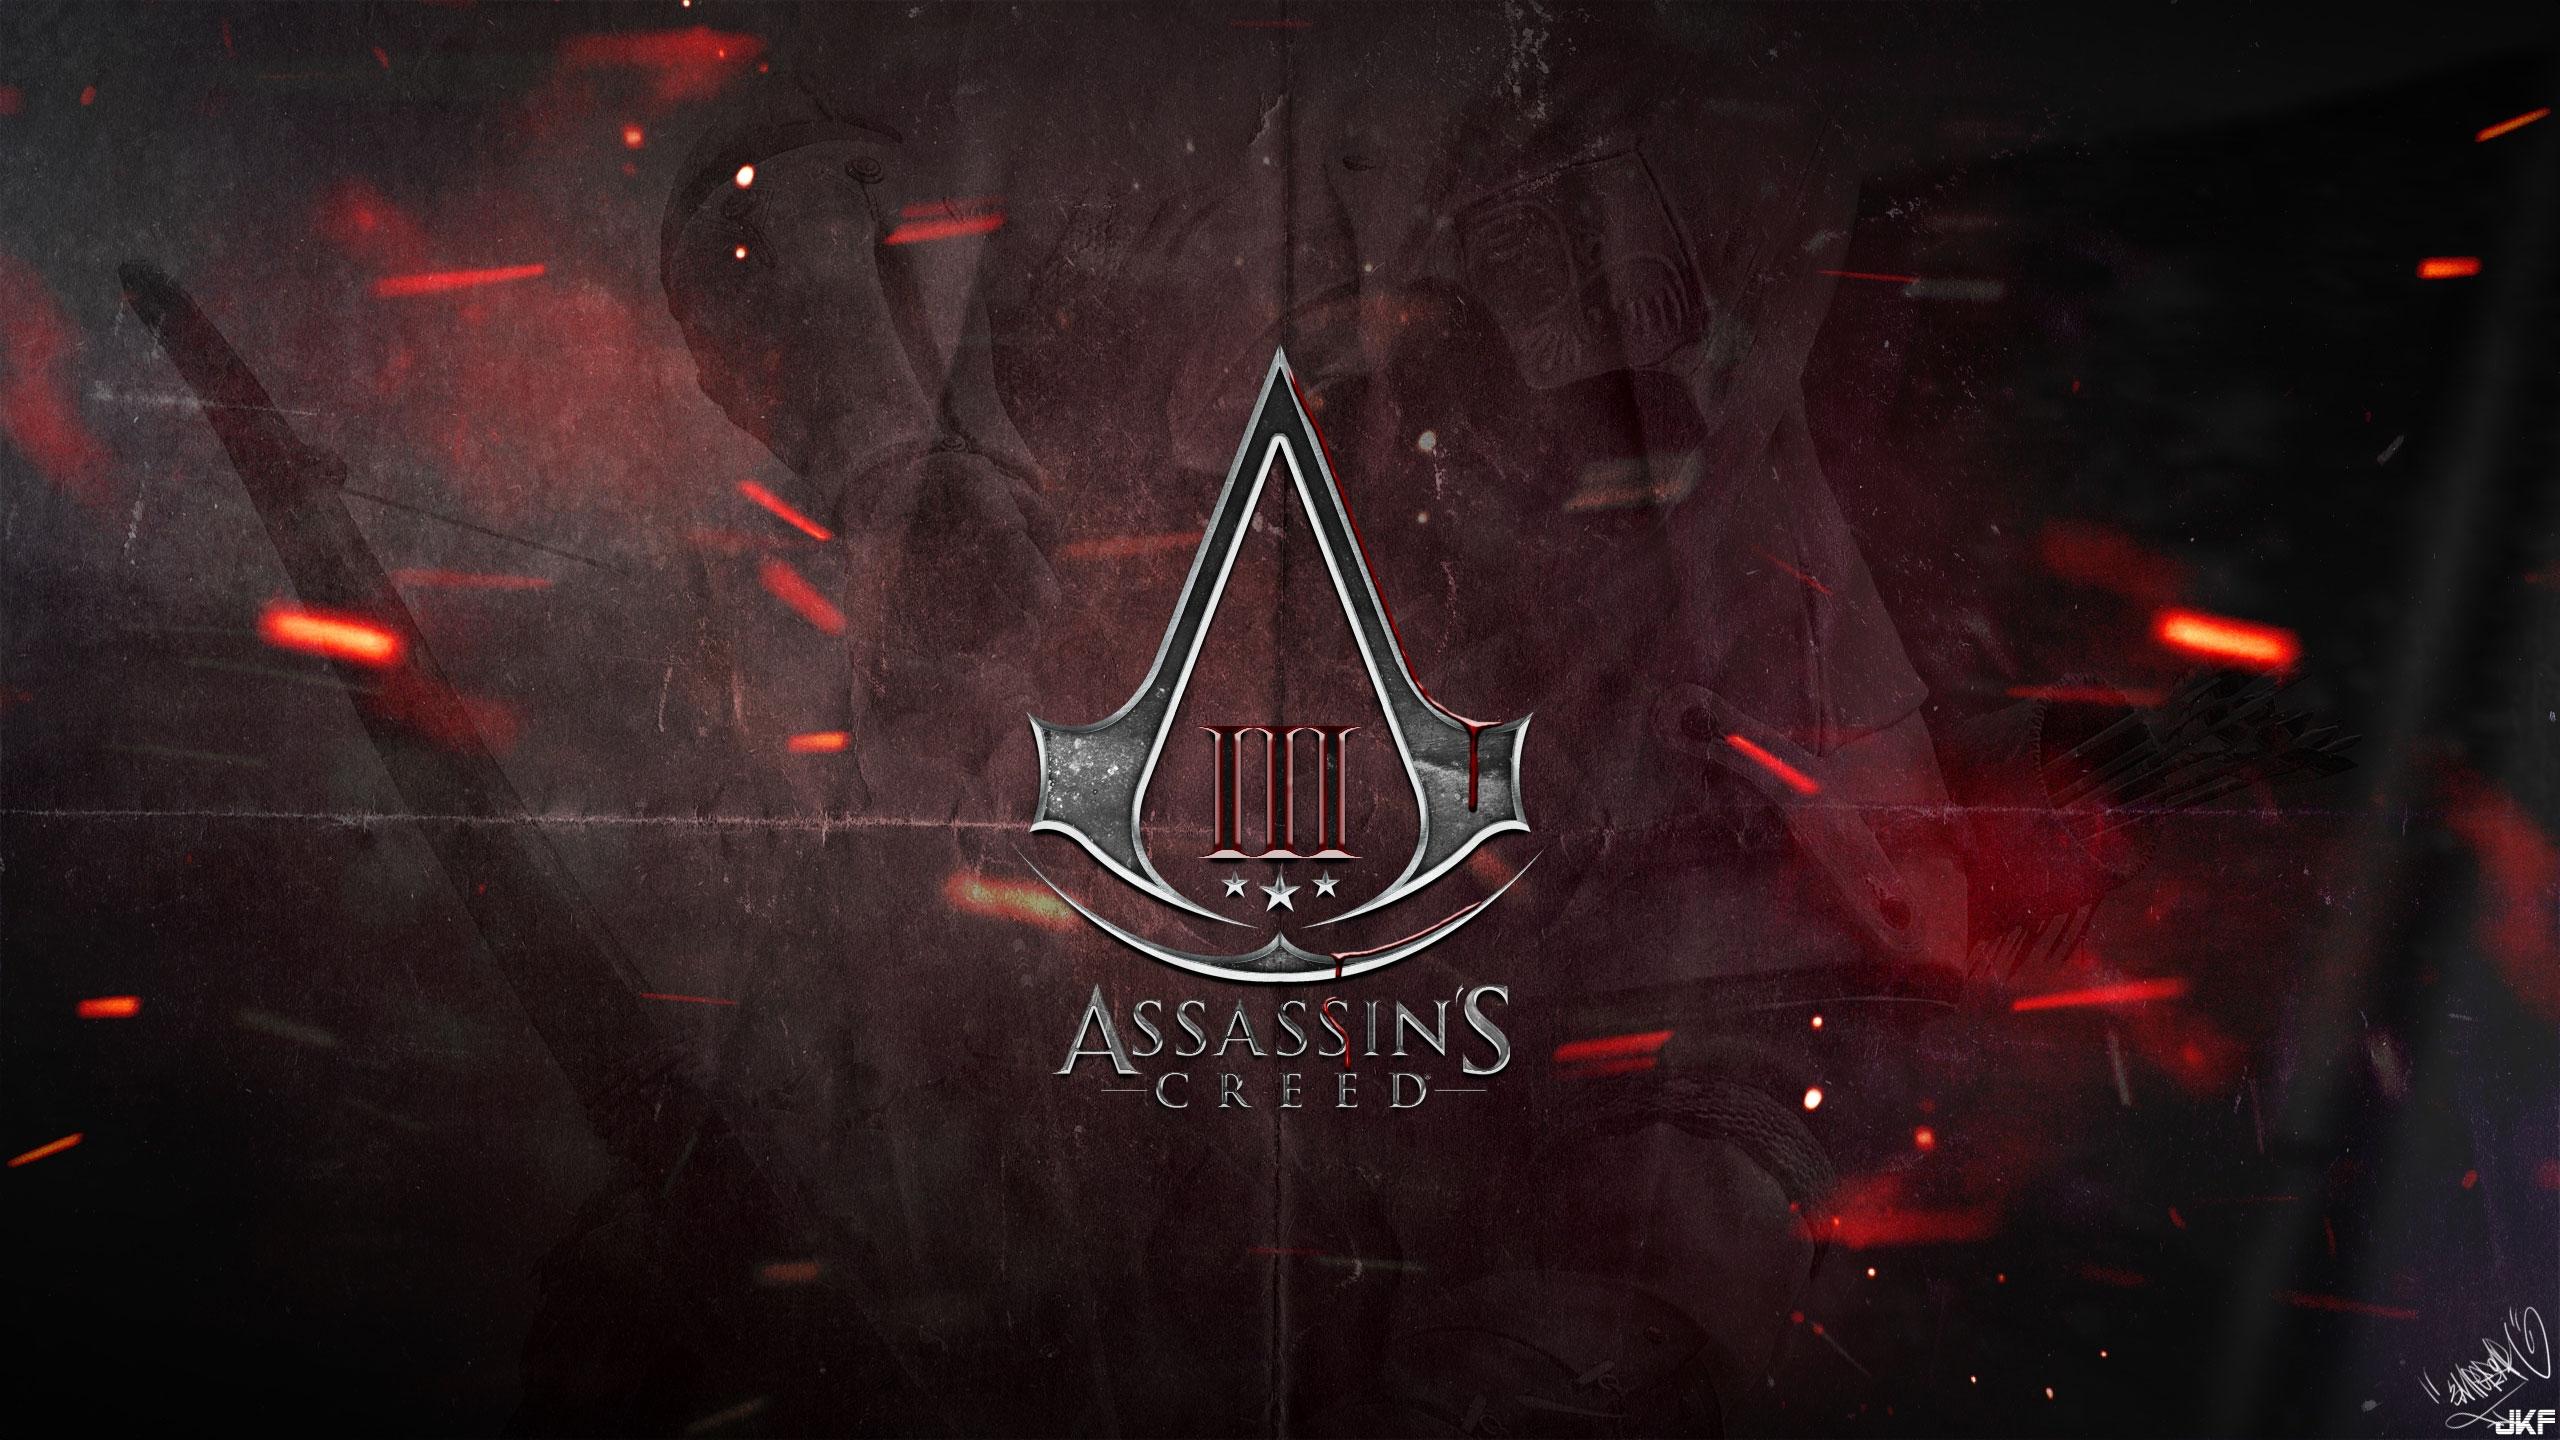 Assassin-s-Creed-3-the-assassins-32112849-2560-1440.jpg